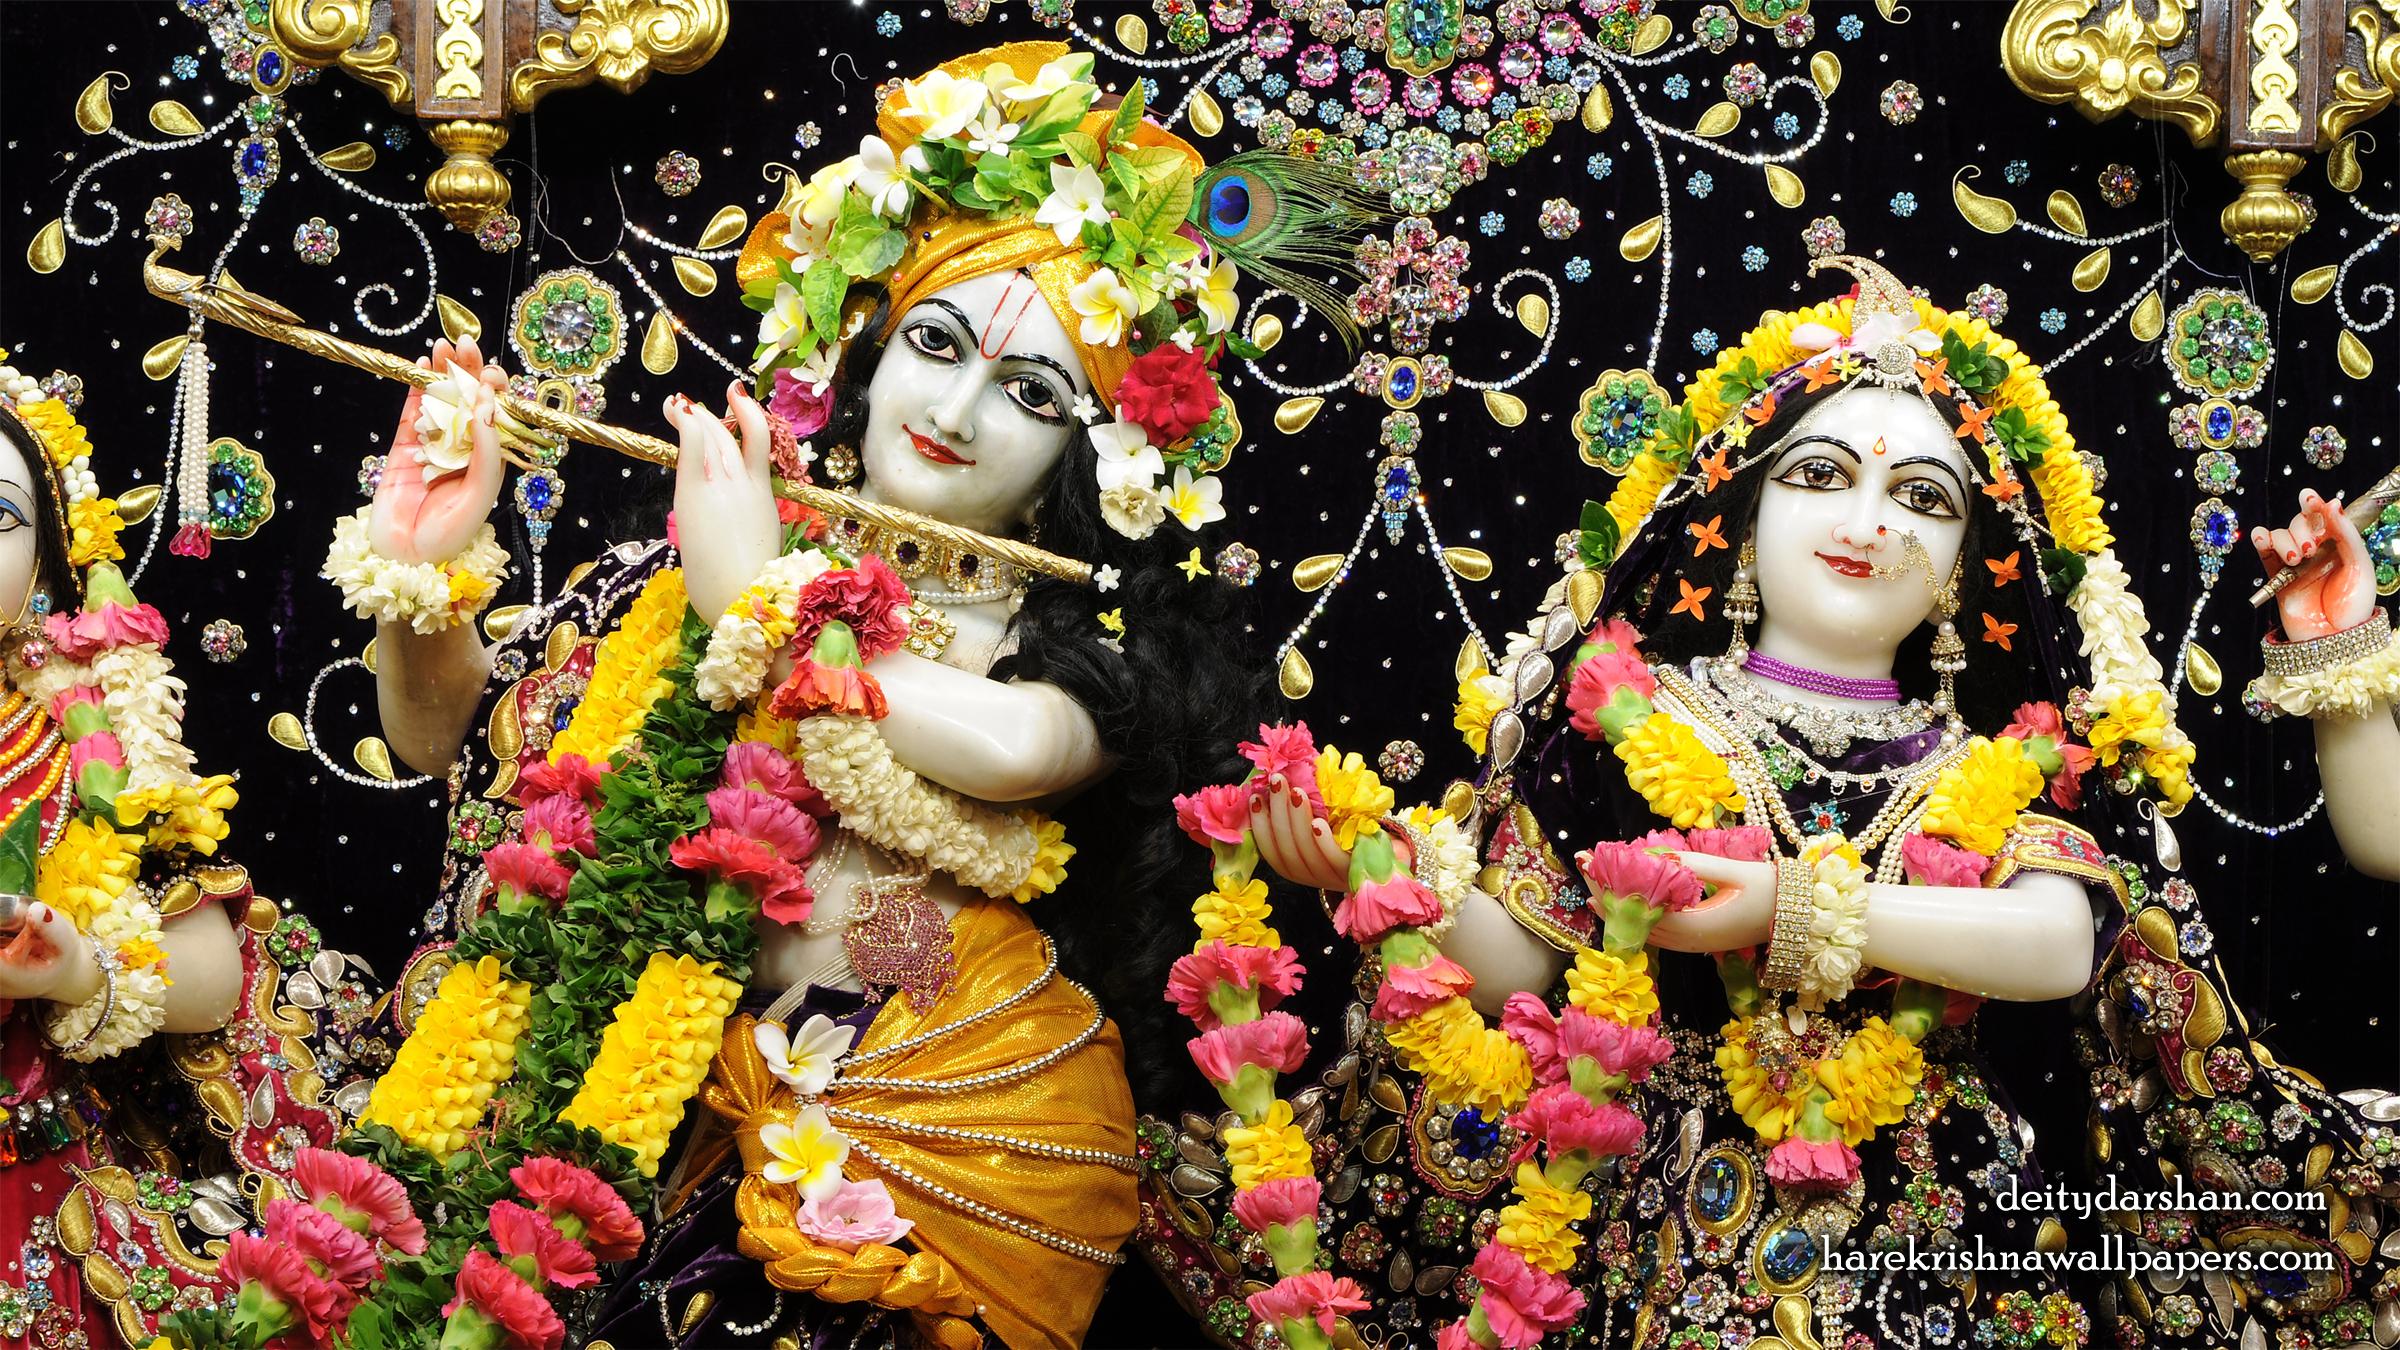 Sri Sri Radha Gopinath Close up Wallpaper (058) Size 2400x1350 Download